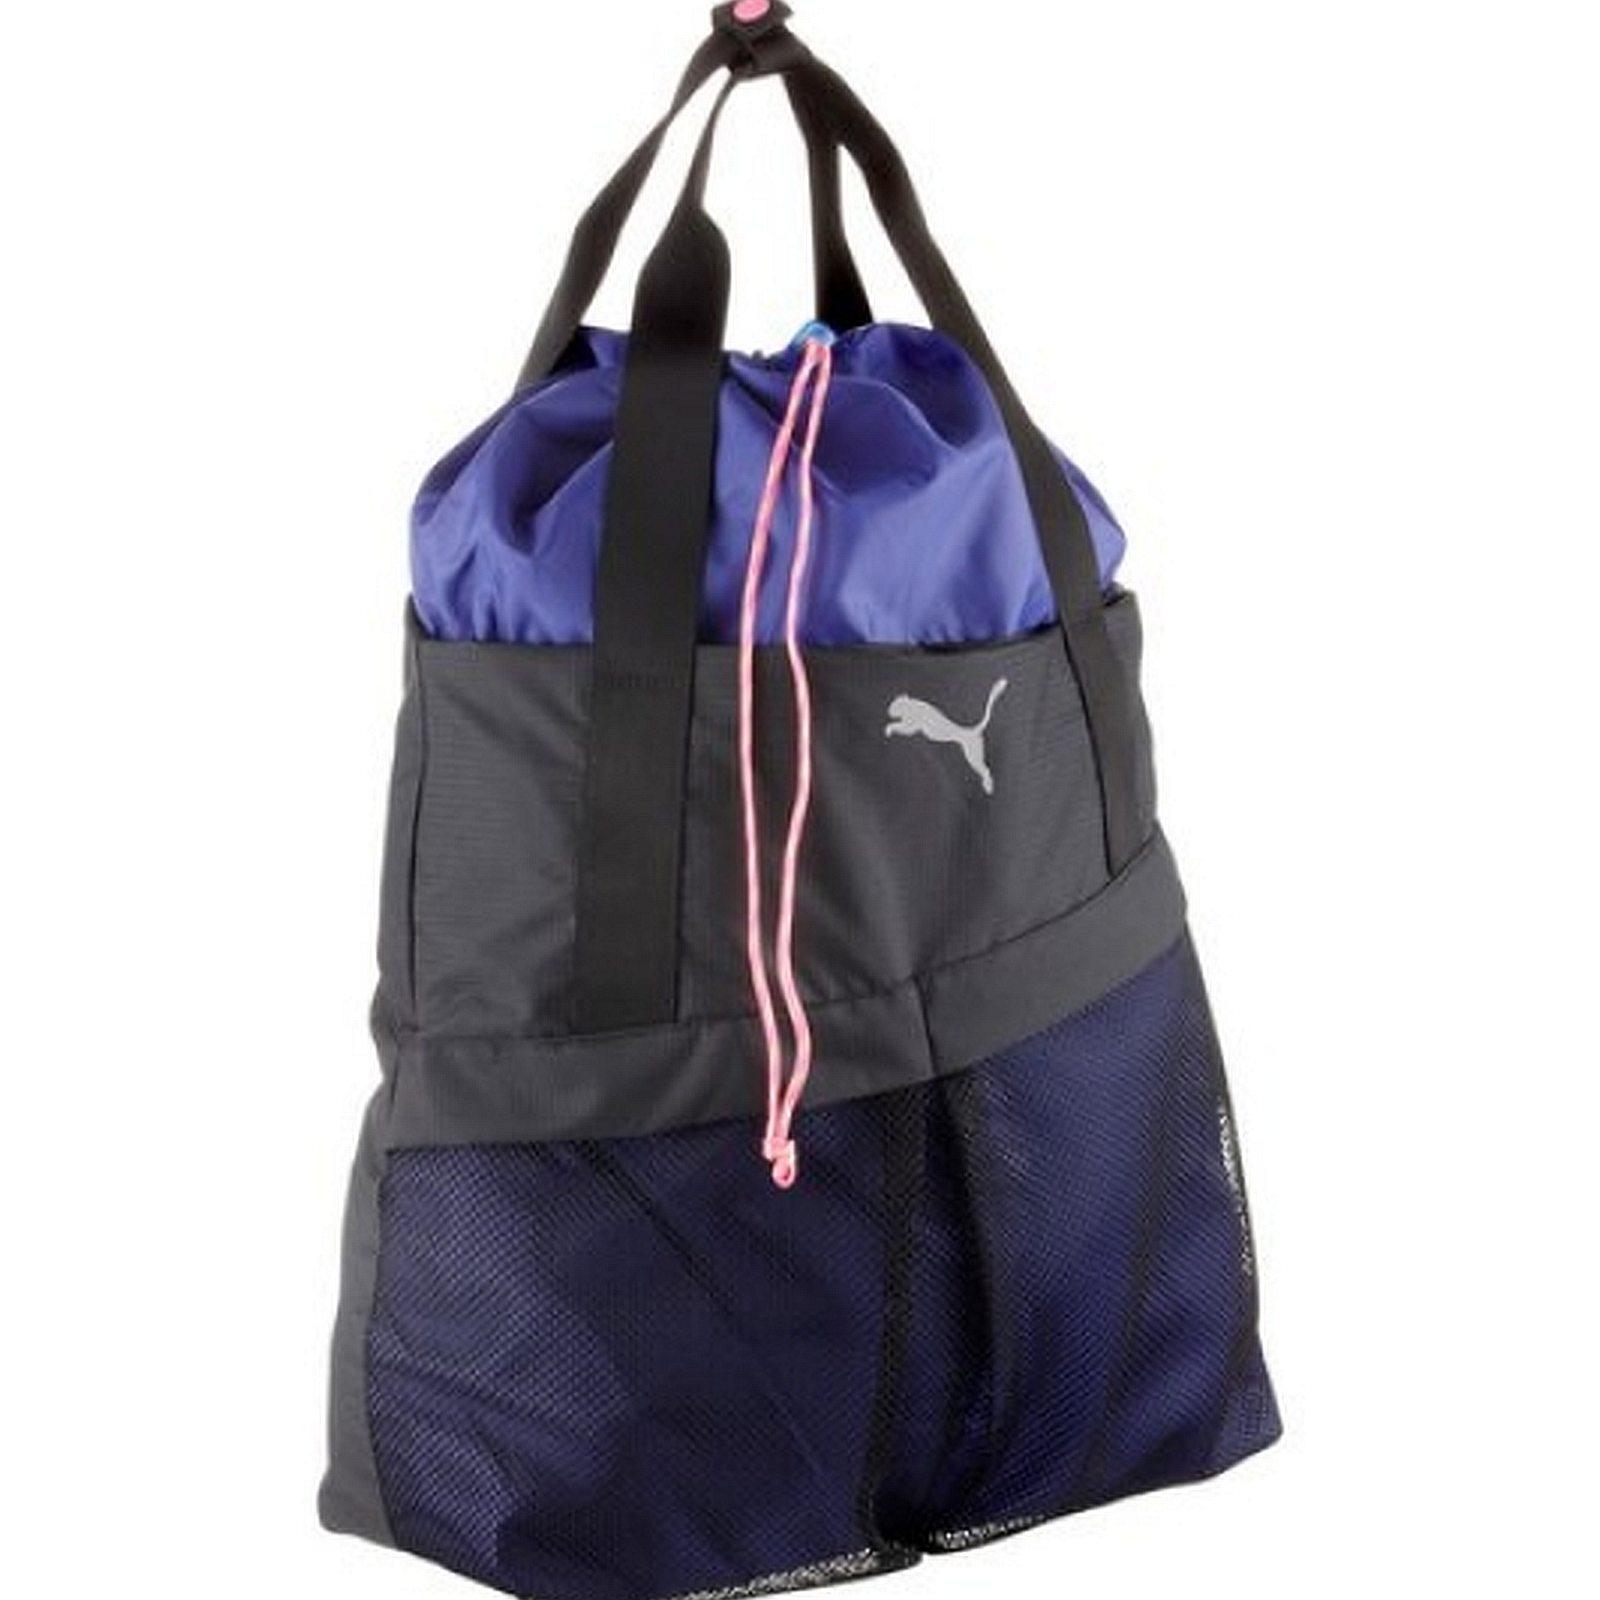 Creative Puma White Ferrari Ls Shoulder Bag Handbags For Women Myntra